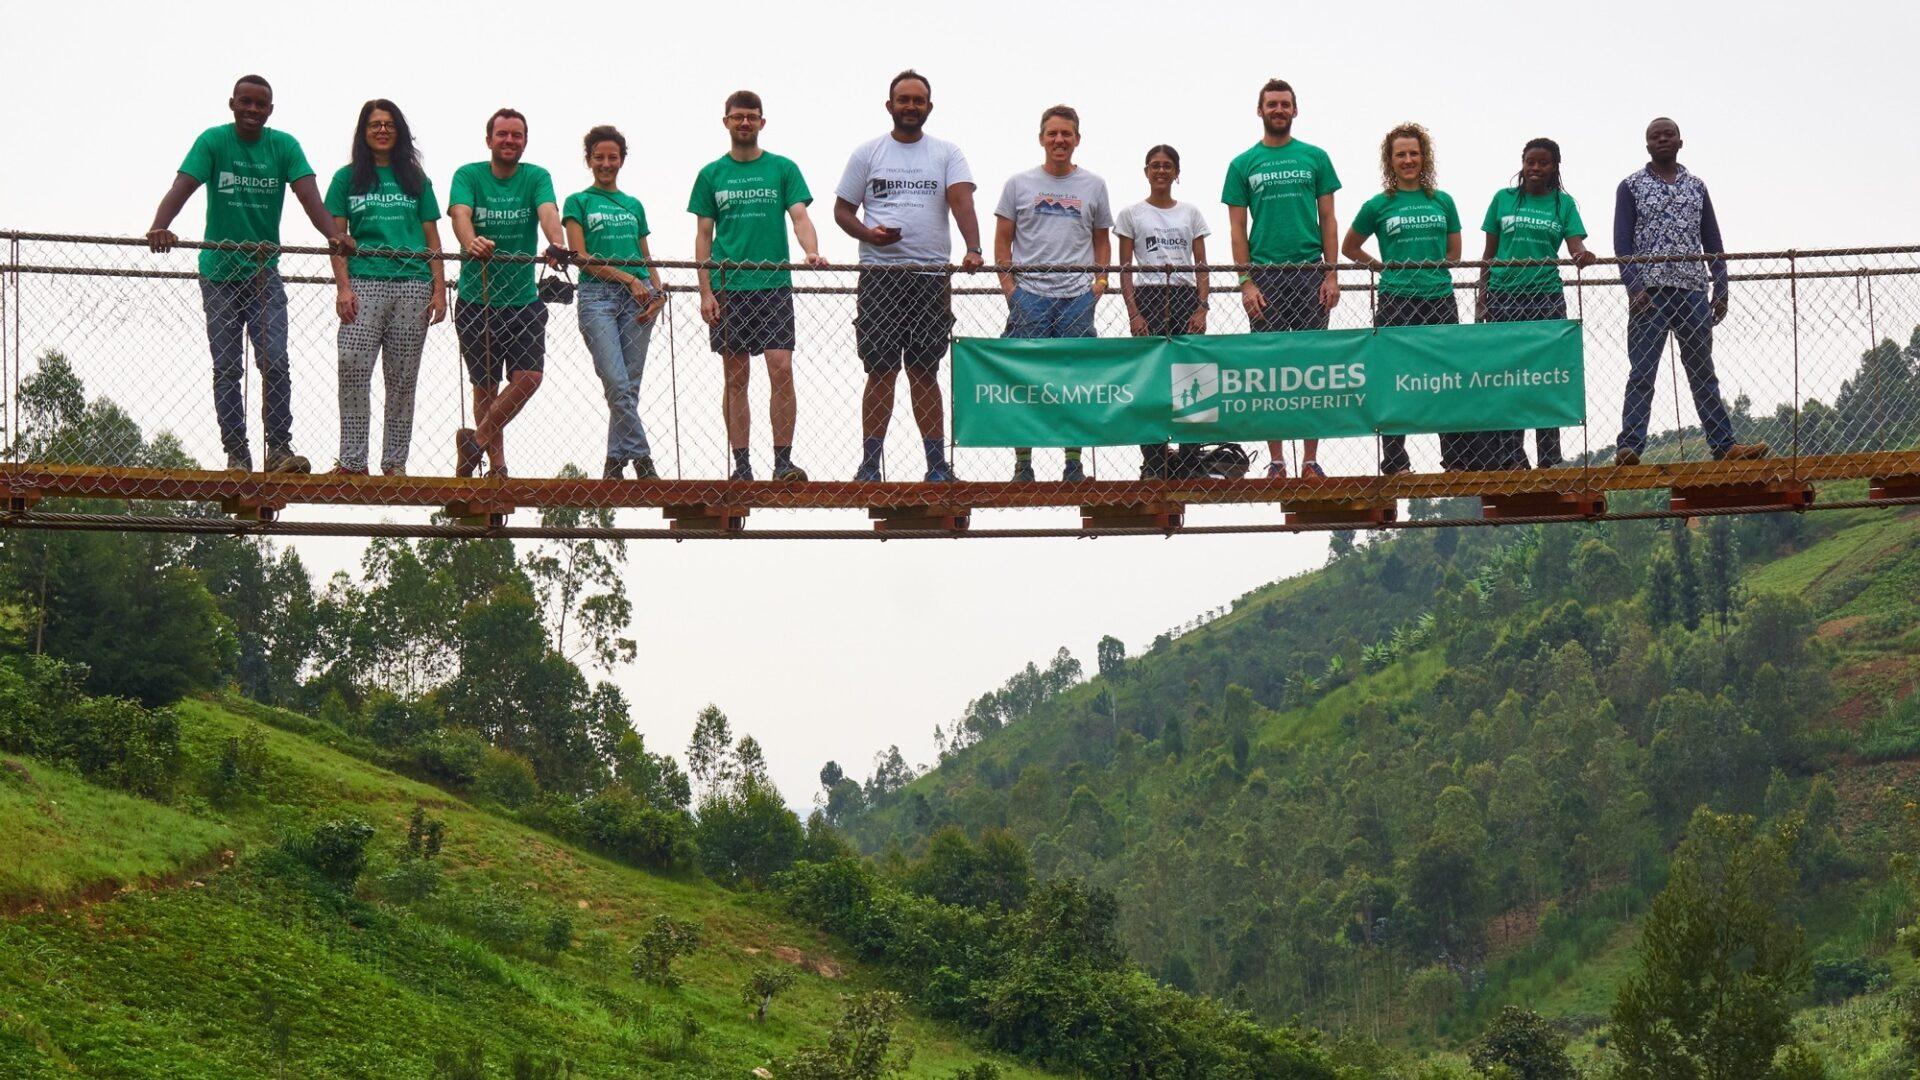 Bridges to Prosperity team posing for photo on bridge